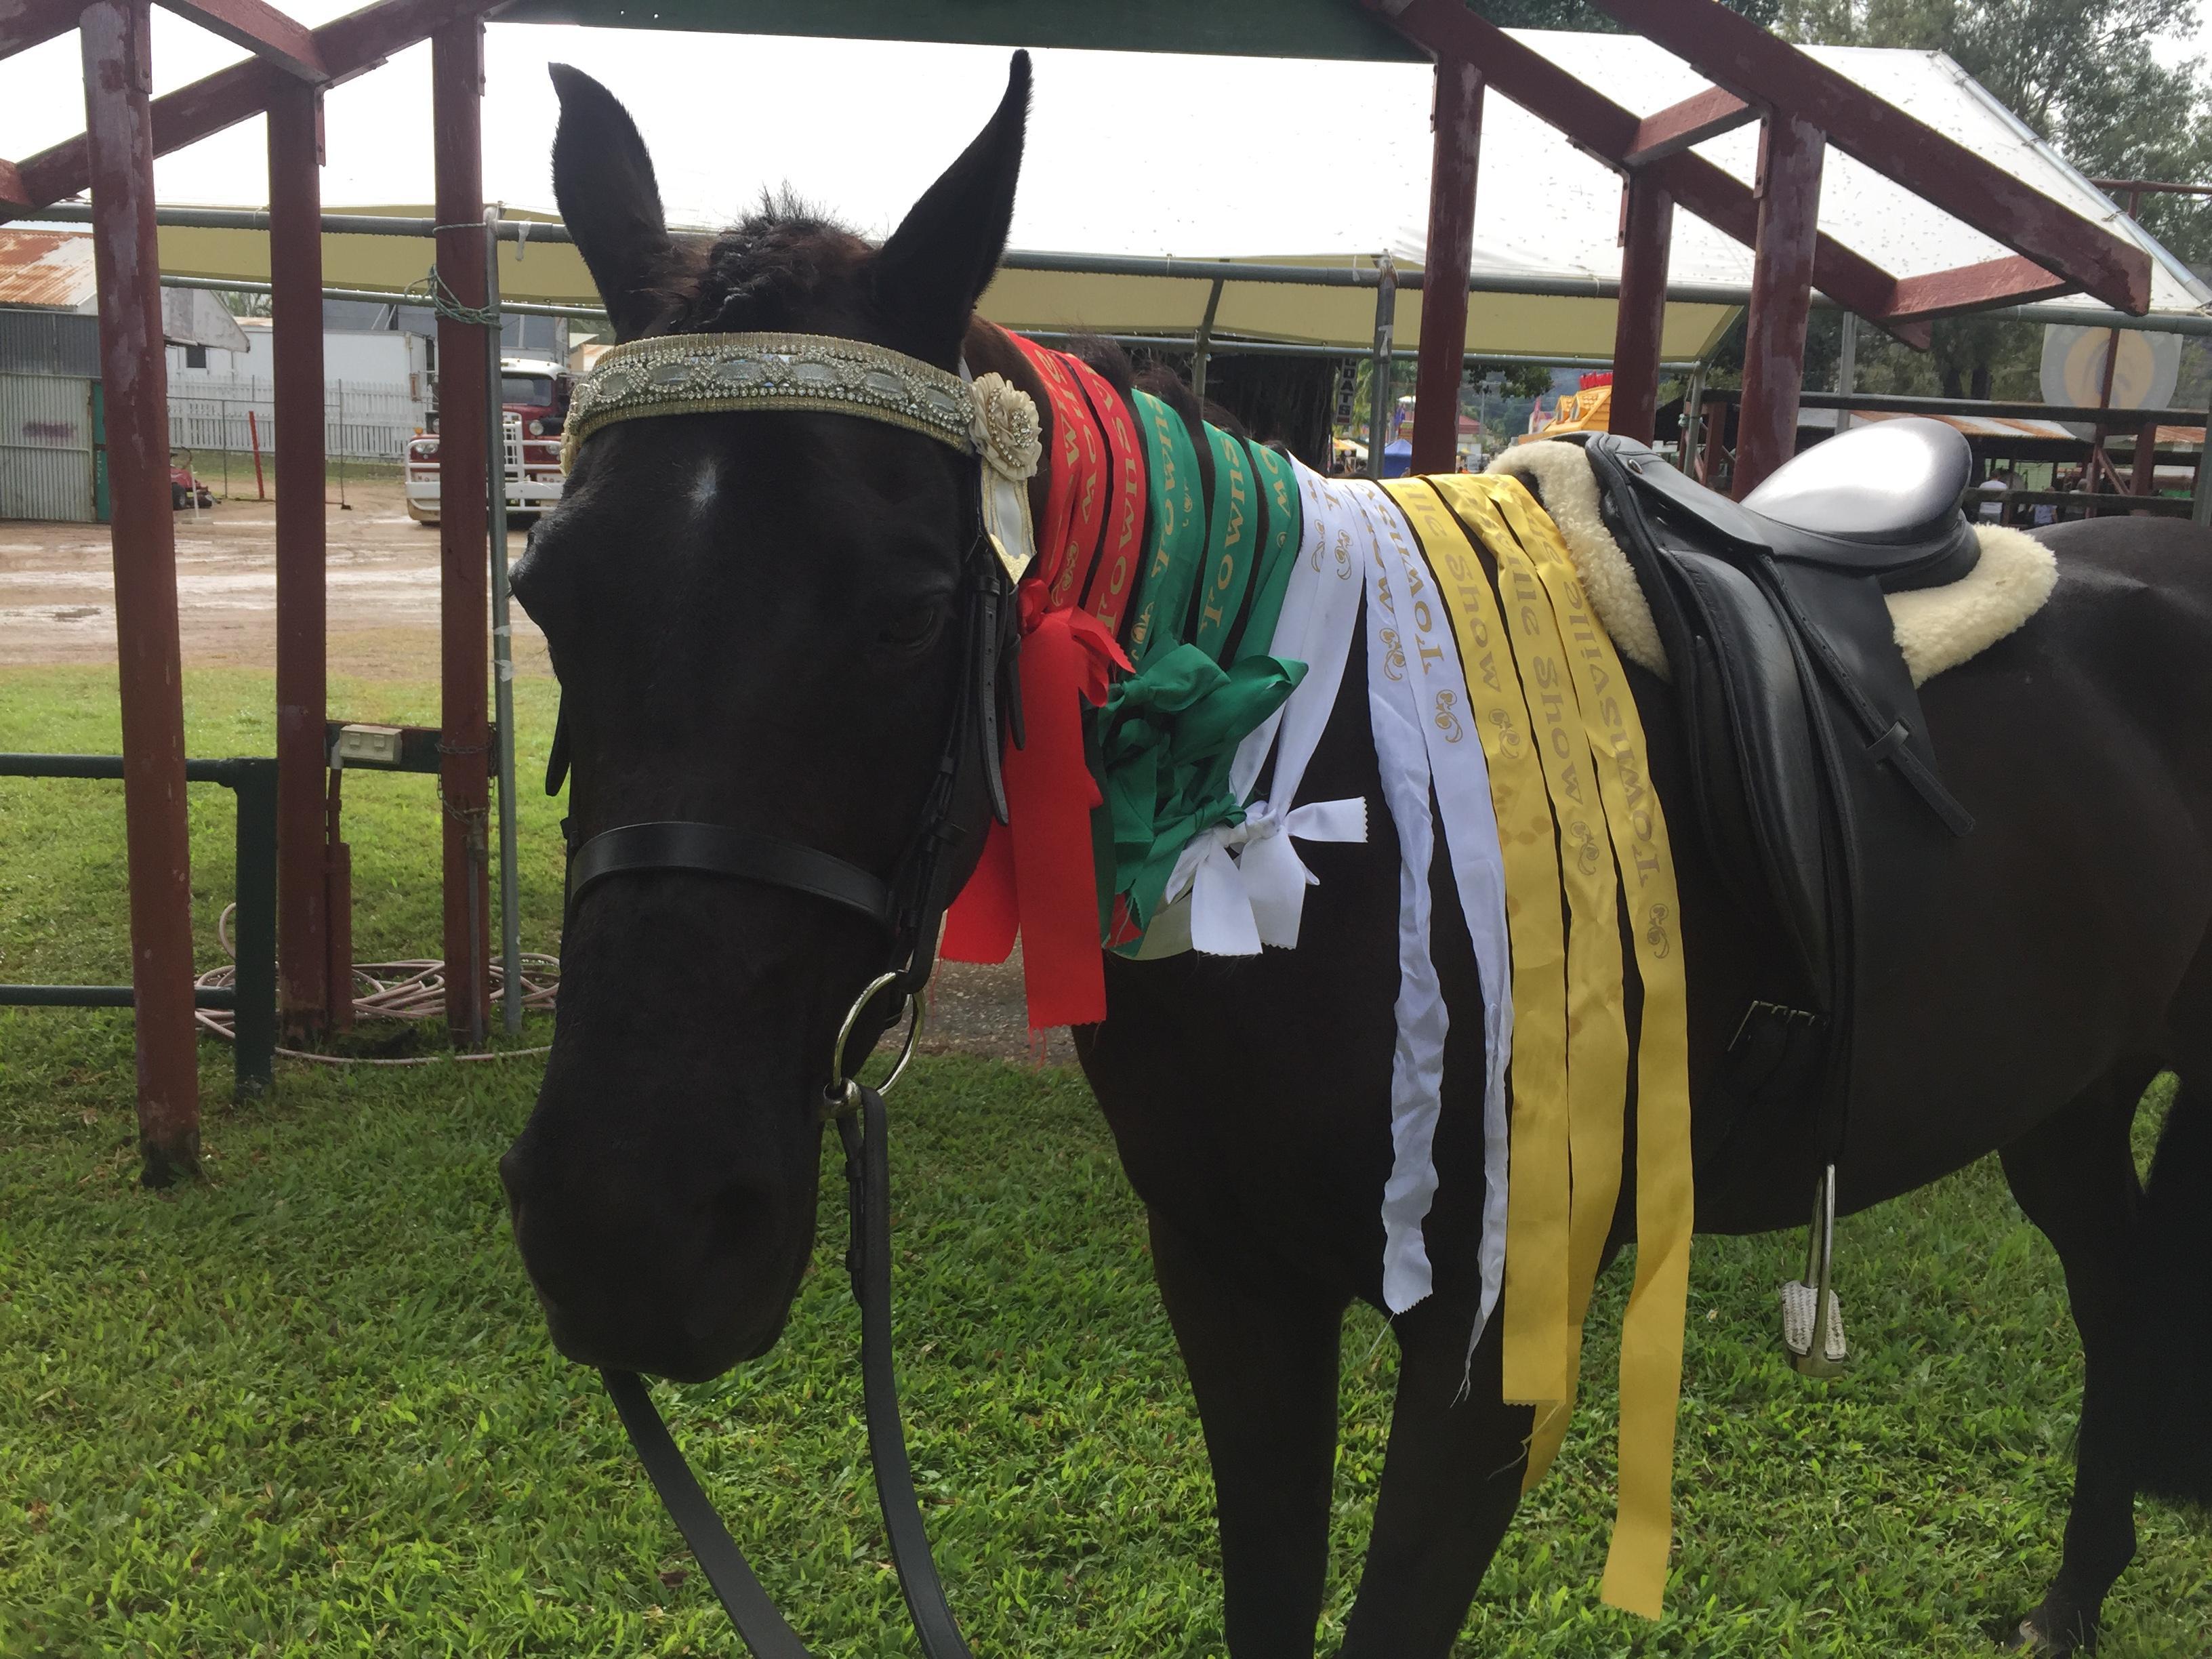 Broodmare Riding Pony